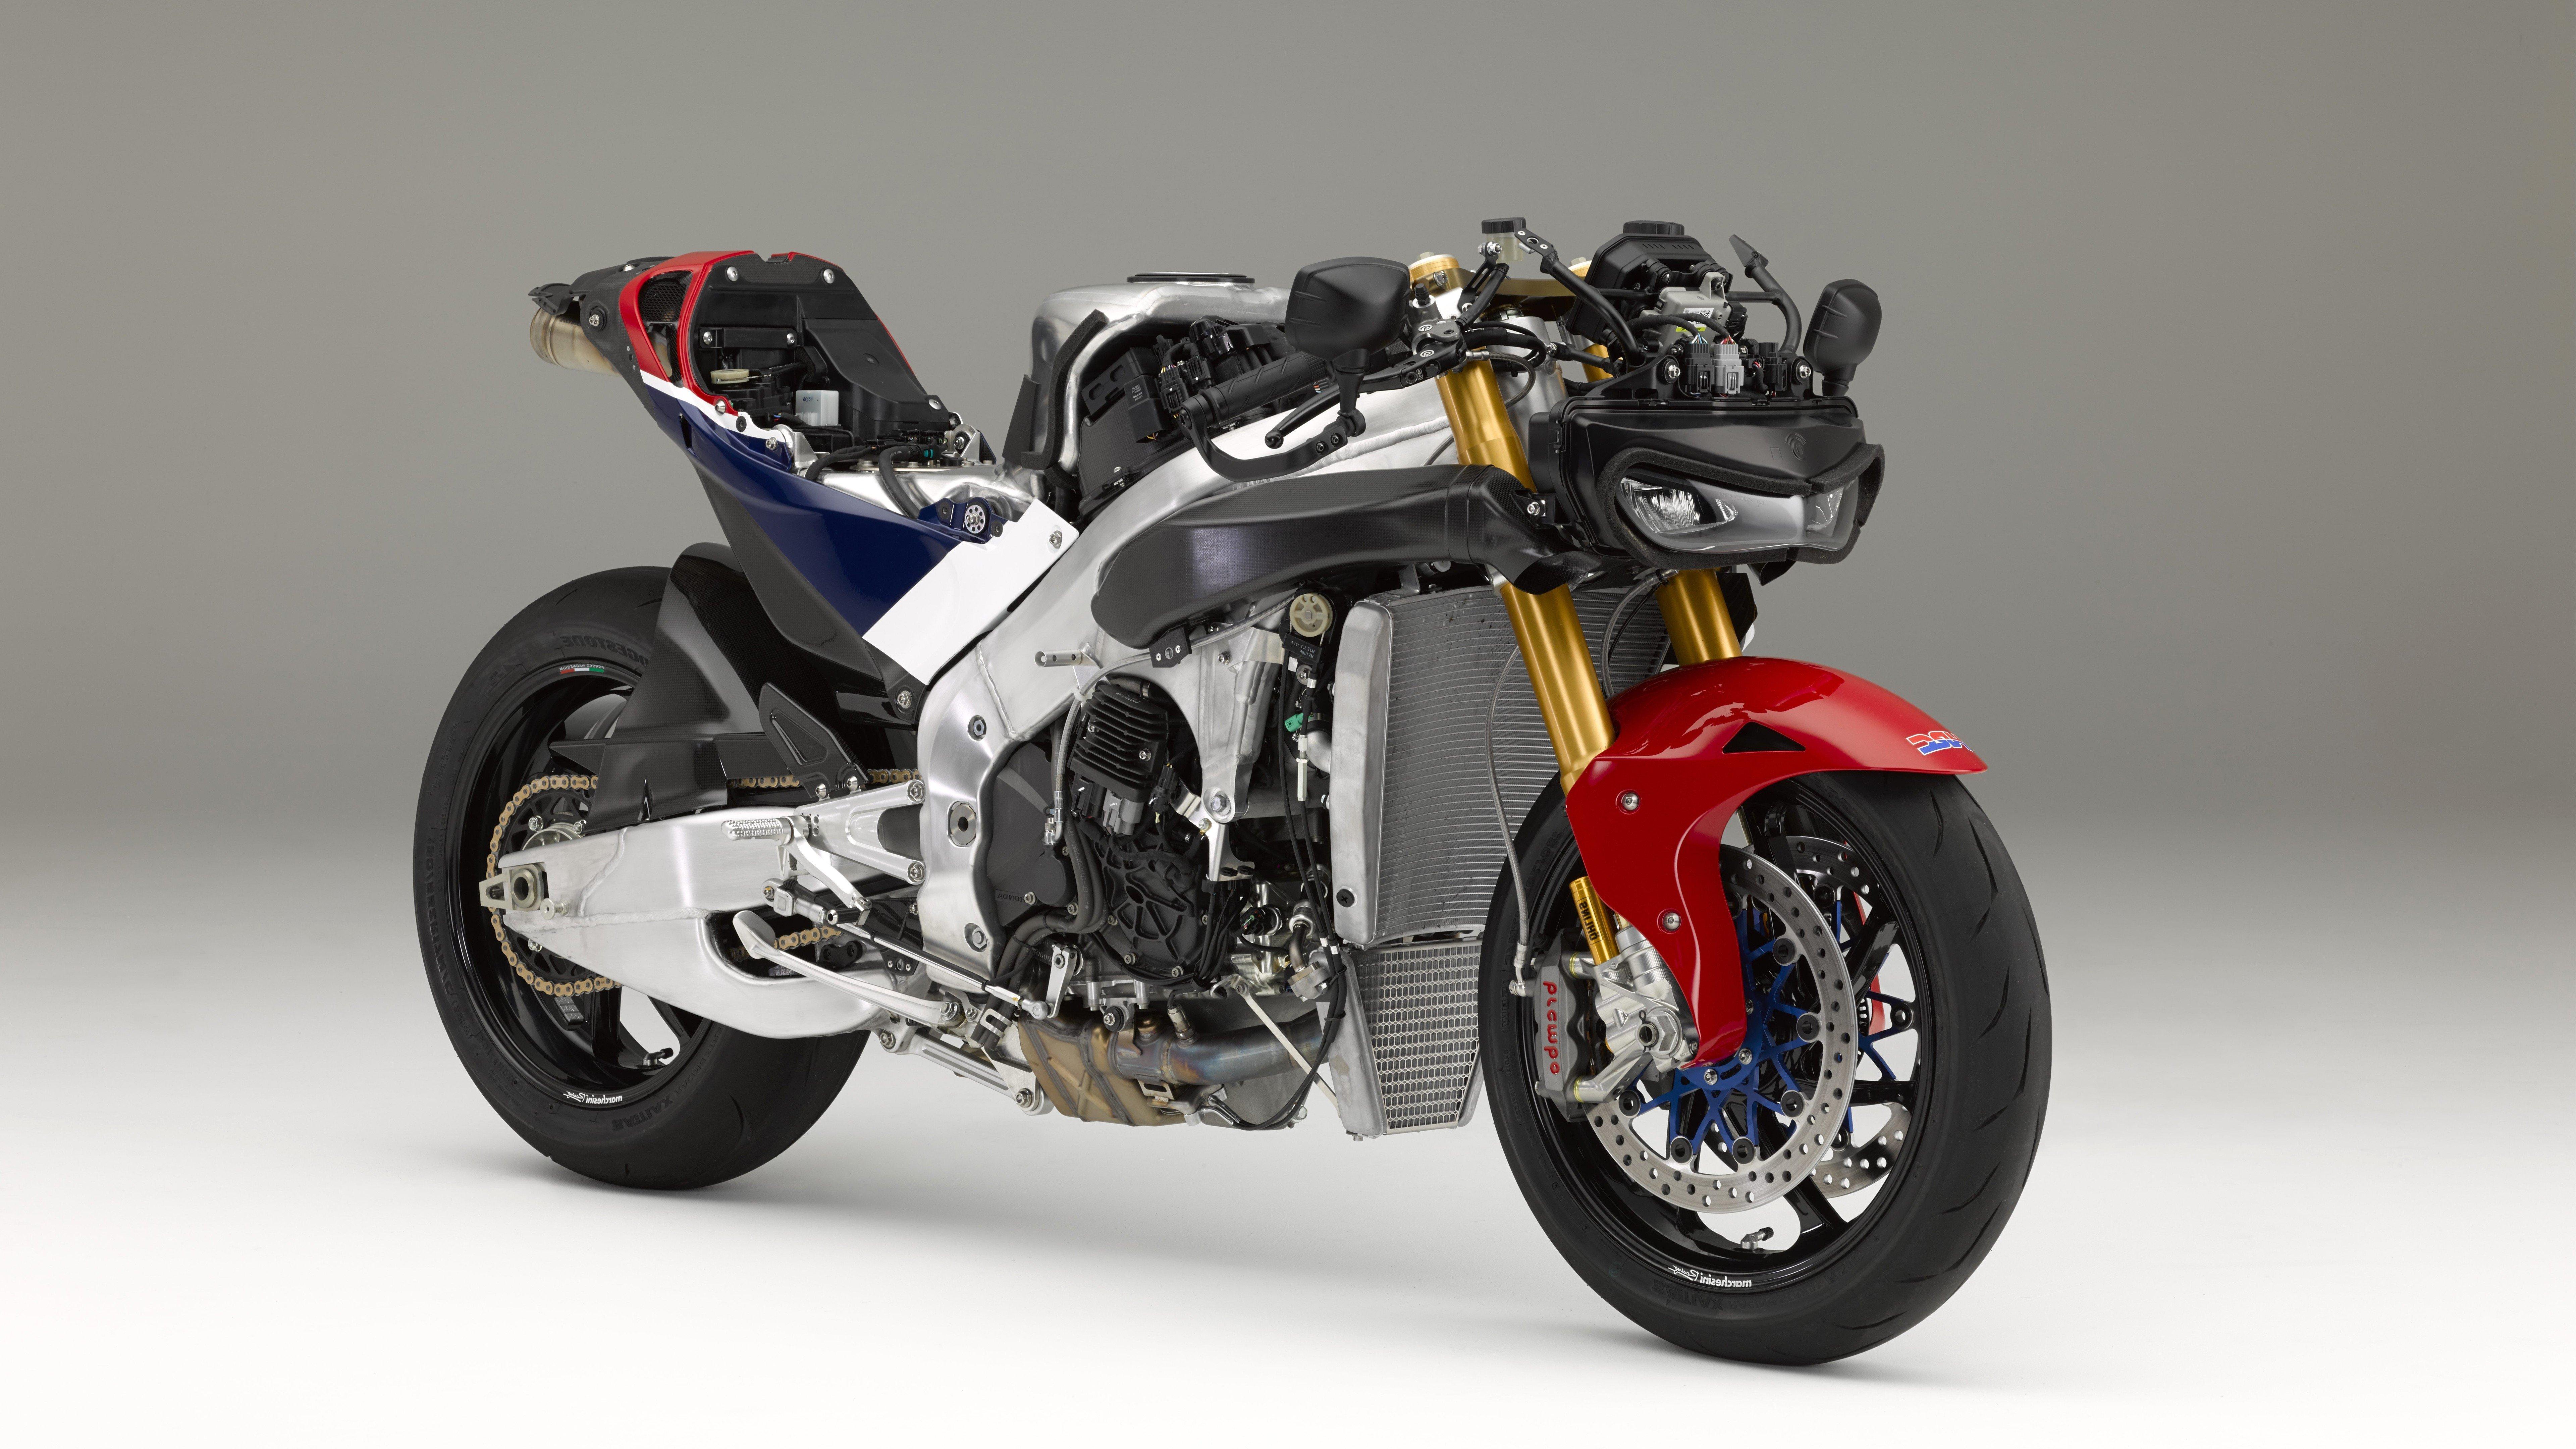 Honda Cbr Motorcycle 4k Hd Desktop Wallpaper For 4k Ultra: Honda Rc213V S Sportbike, HD Bikes, 4k Wallpapers, Images